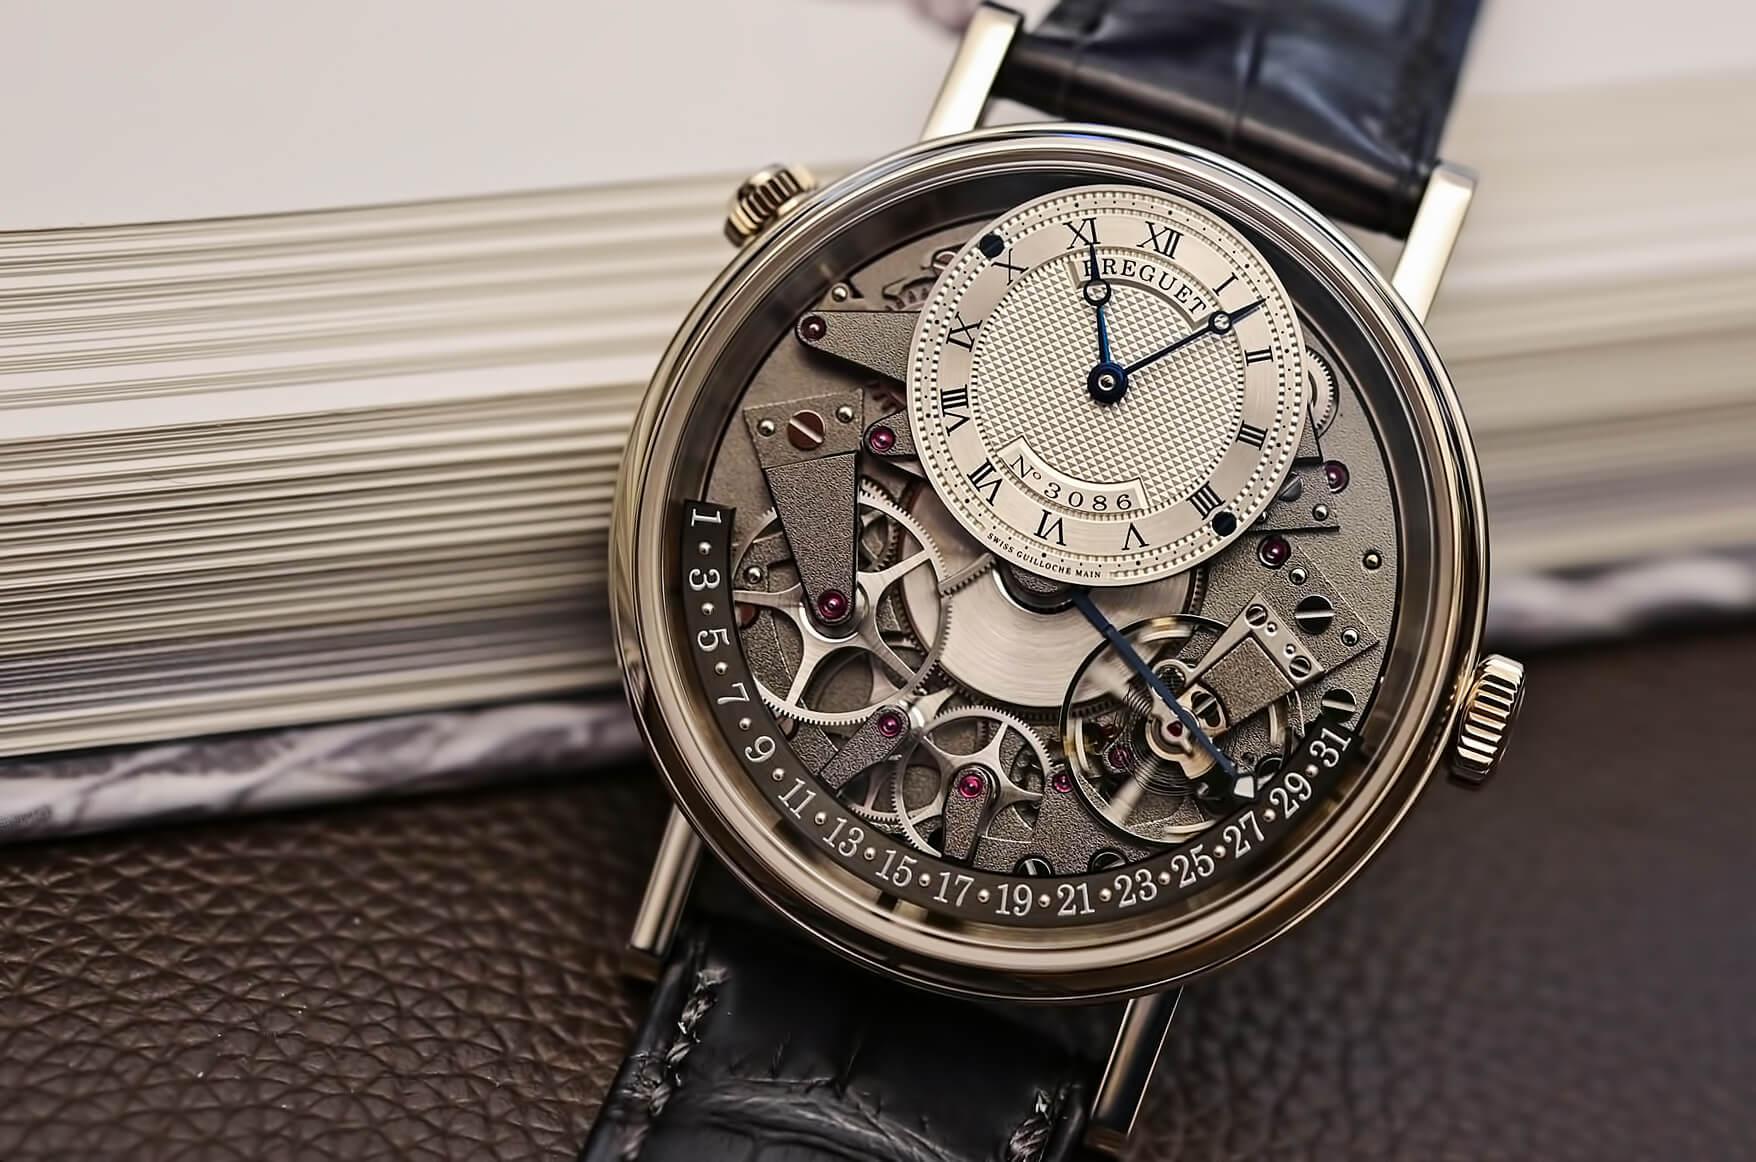 Часы Breguet Tradition Automatique Seconde Rétrograde 7097